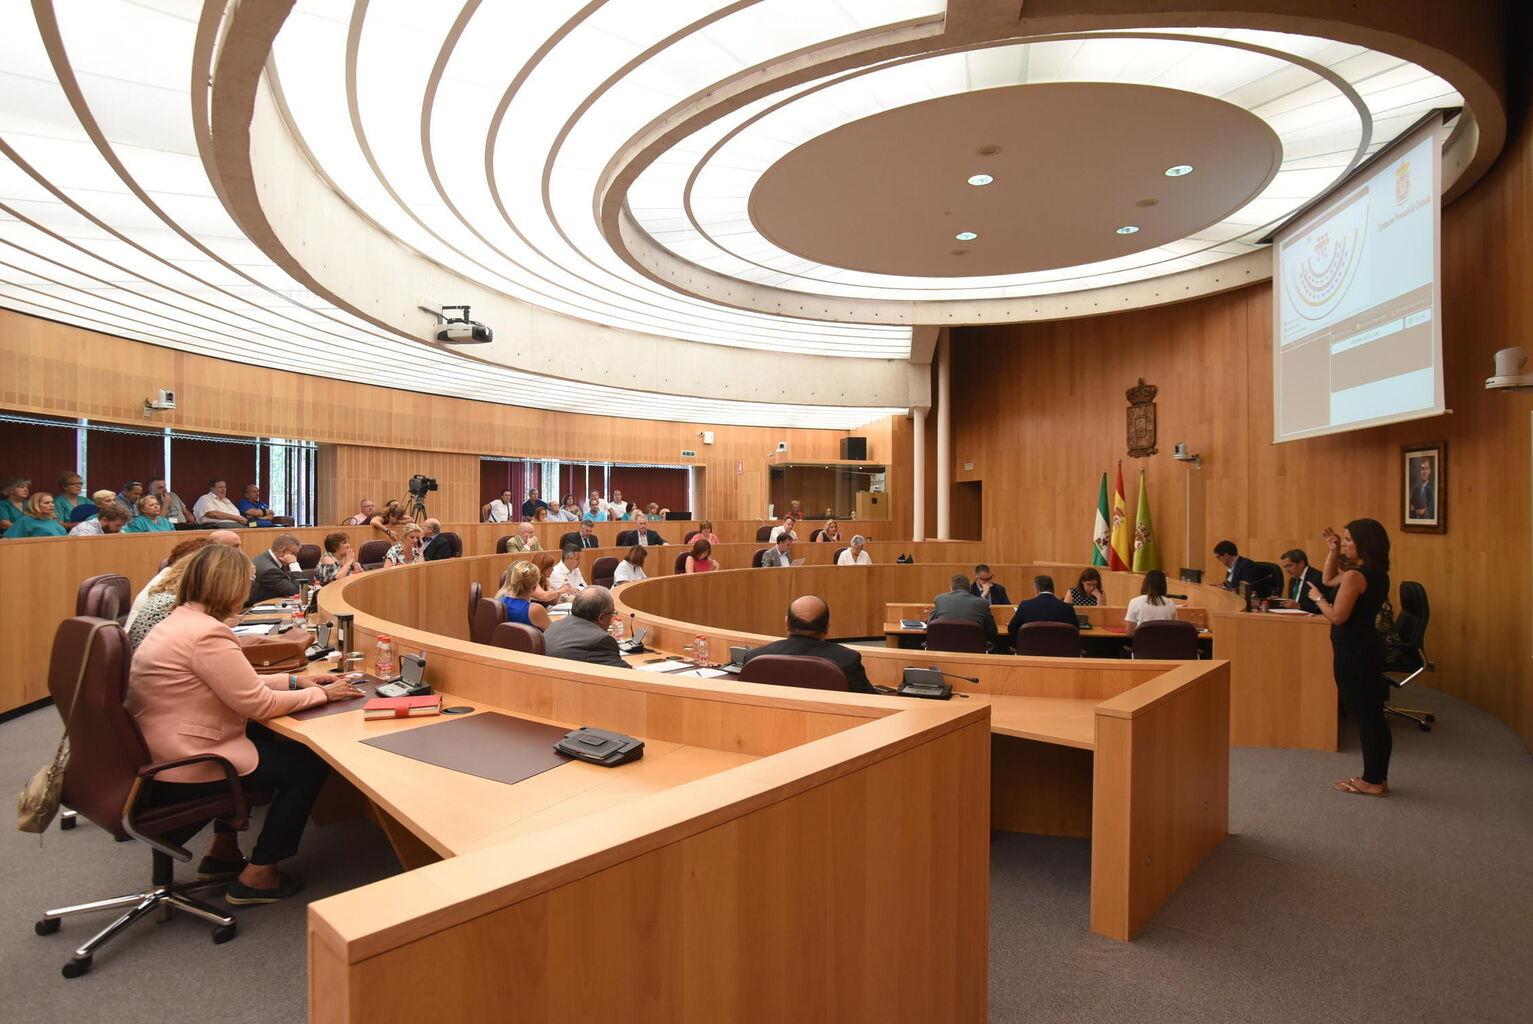 Diputaci N Aprueba Una Partida De 10 Millones Para Inversiones  # Muebles Padilla Cordoba